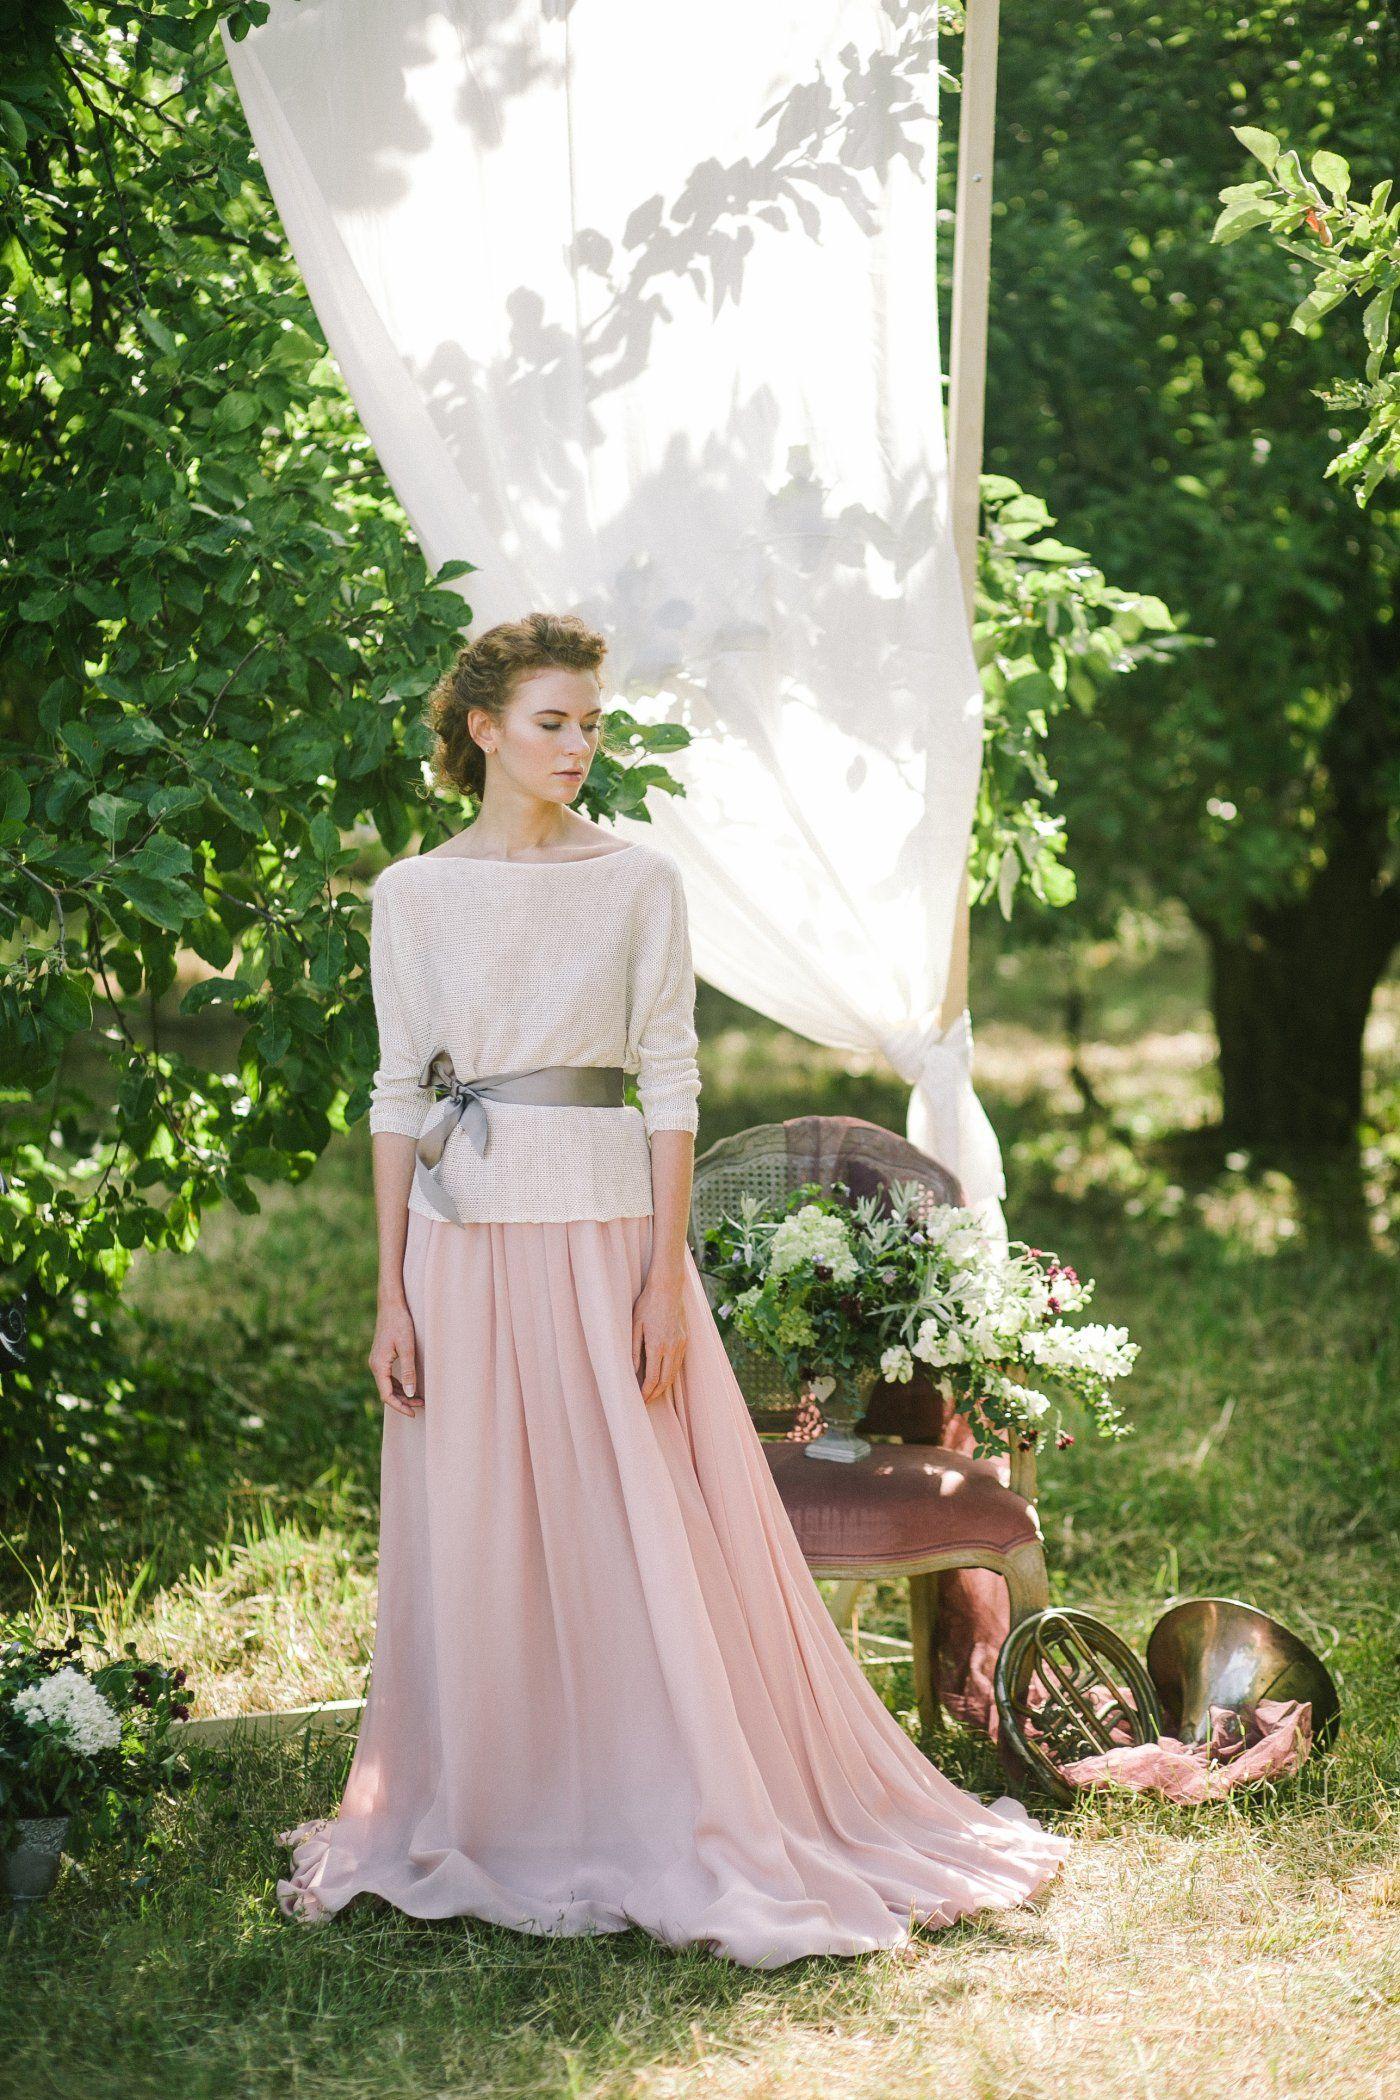 Light pink spaghetti strap wedding dress with lace